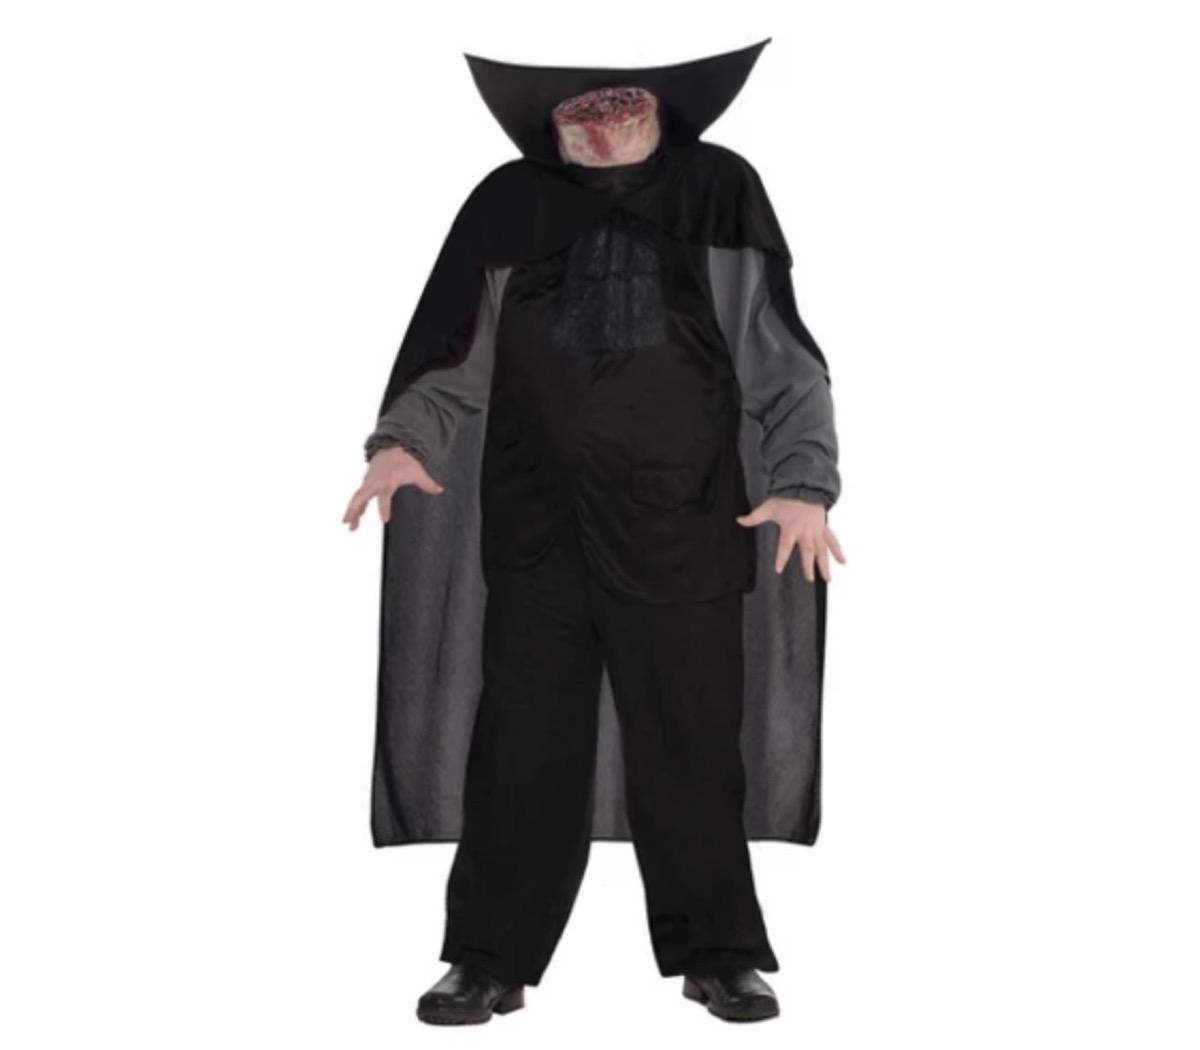 headless horseman costume, target halloween costumes